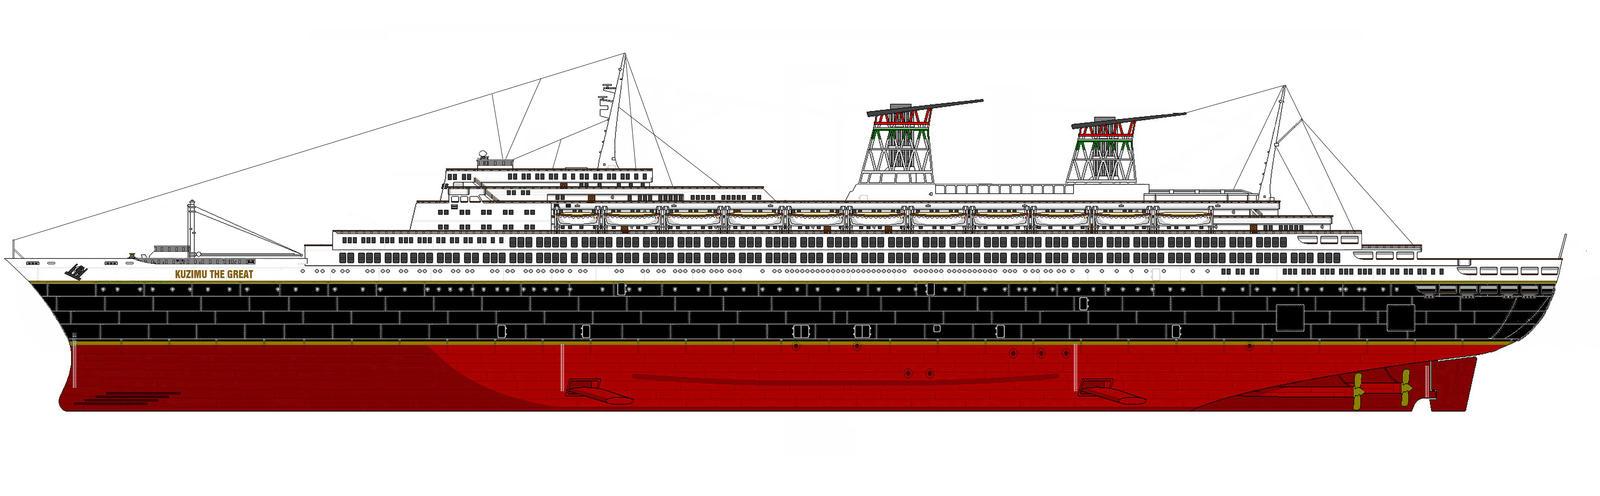 Kuzimu The Great Ocean Liner By Mufasa111 On DeviantArt